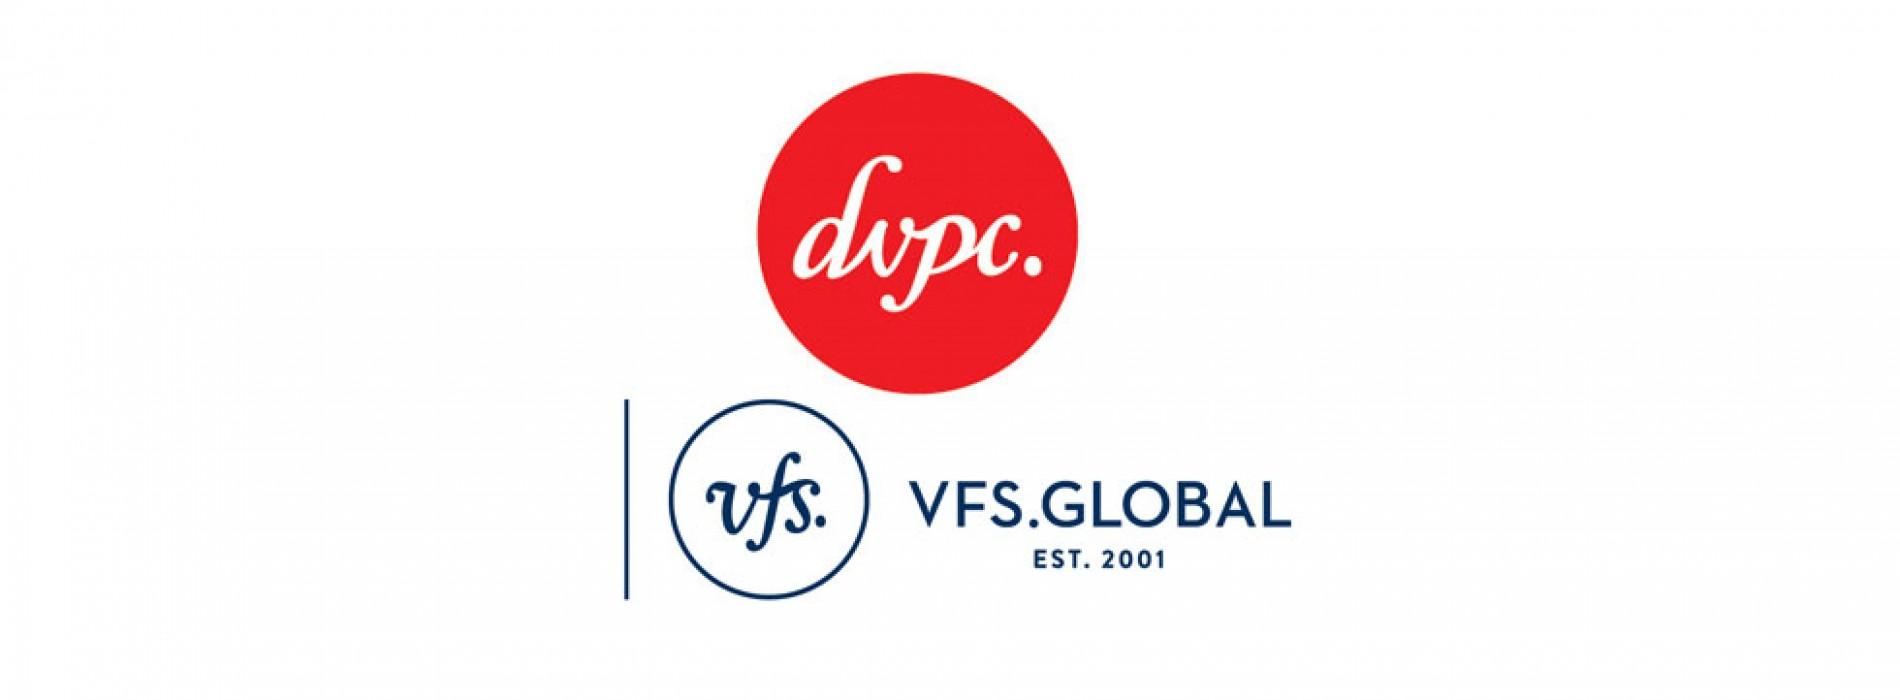 DVPC beckons visitors with attractive visa offer